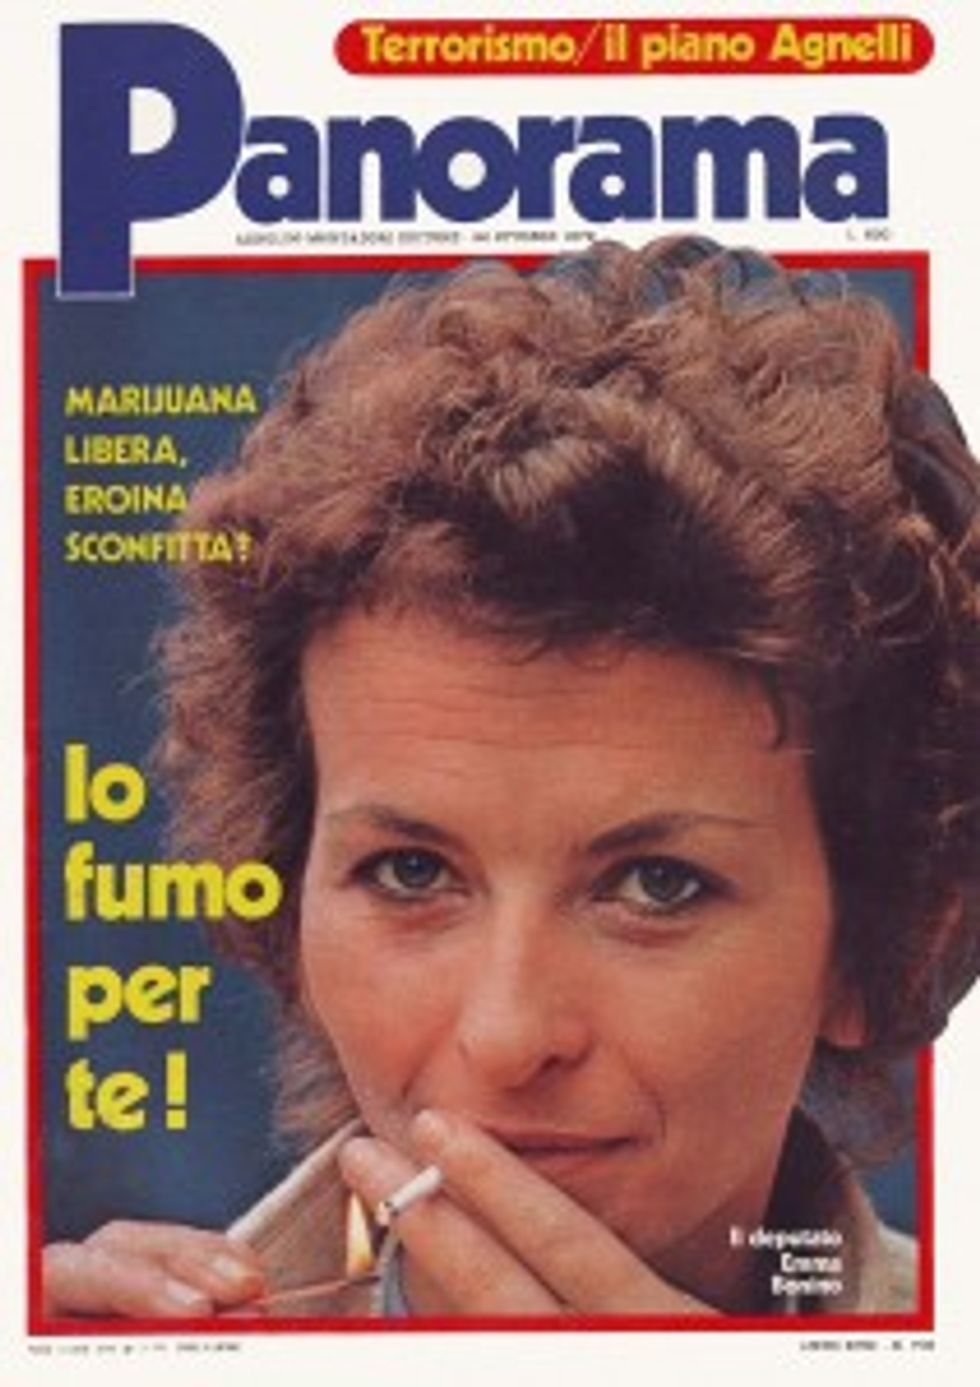 1979 Panorama e la marijuana libera